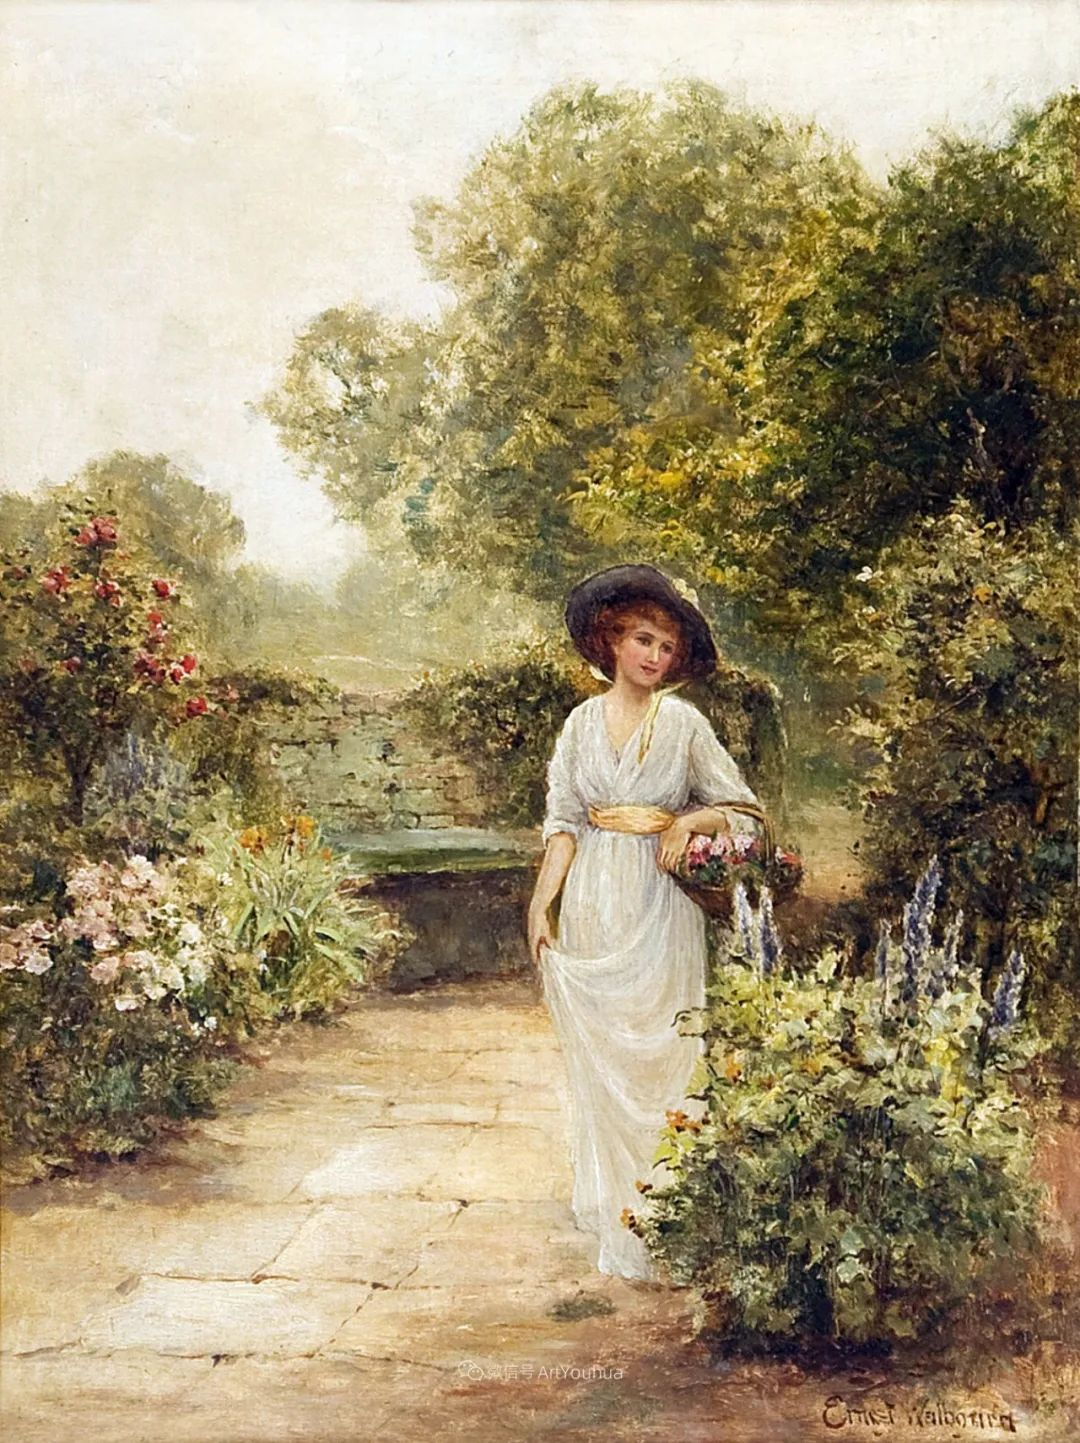 美丽村姑与诗意田园,英国画家Ernest Charles Walbourn作品(下)插图29